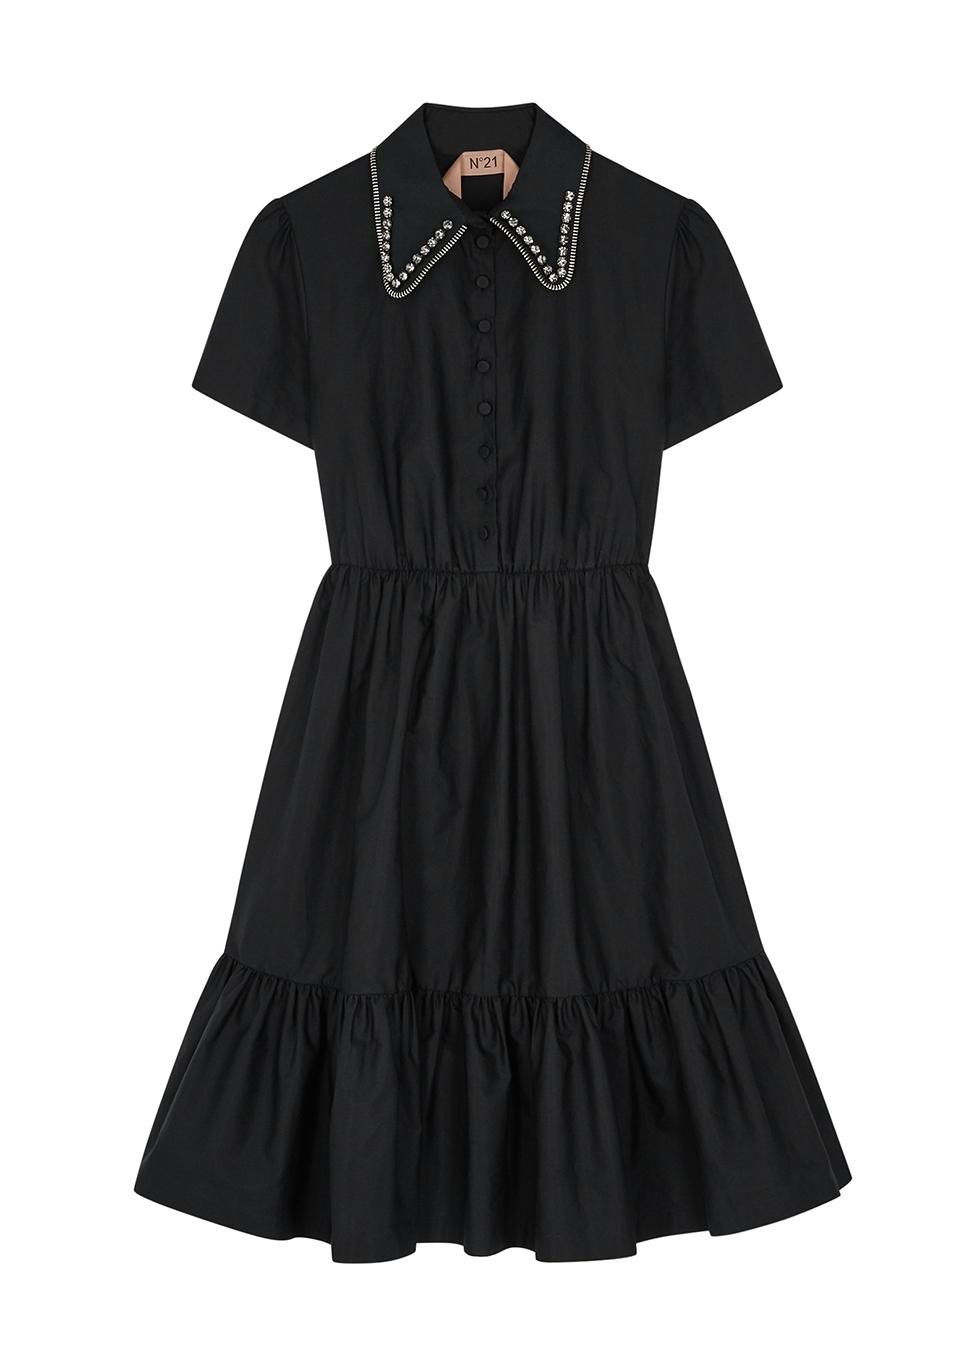 404b3381a12f Designer Dresses & Designer Gowns - Harvey Nichols